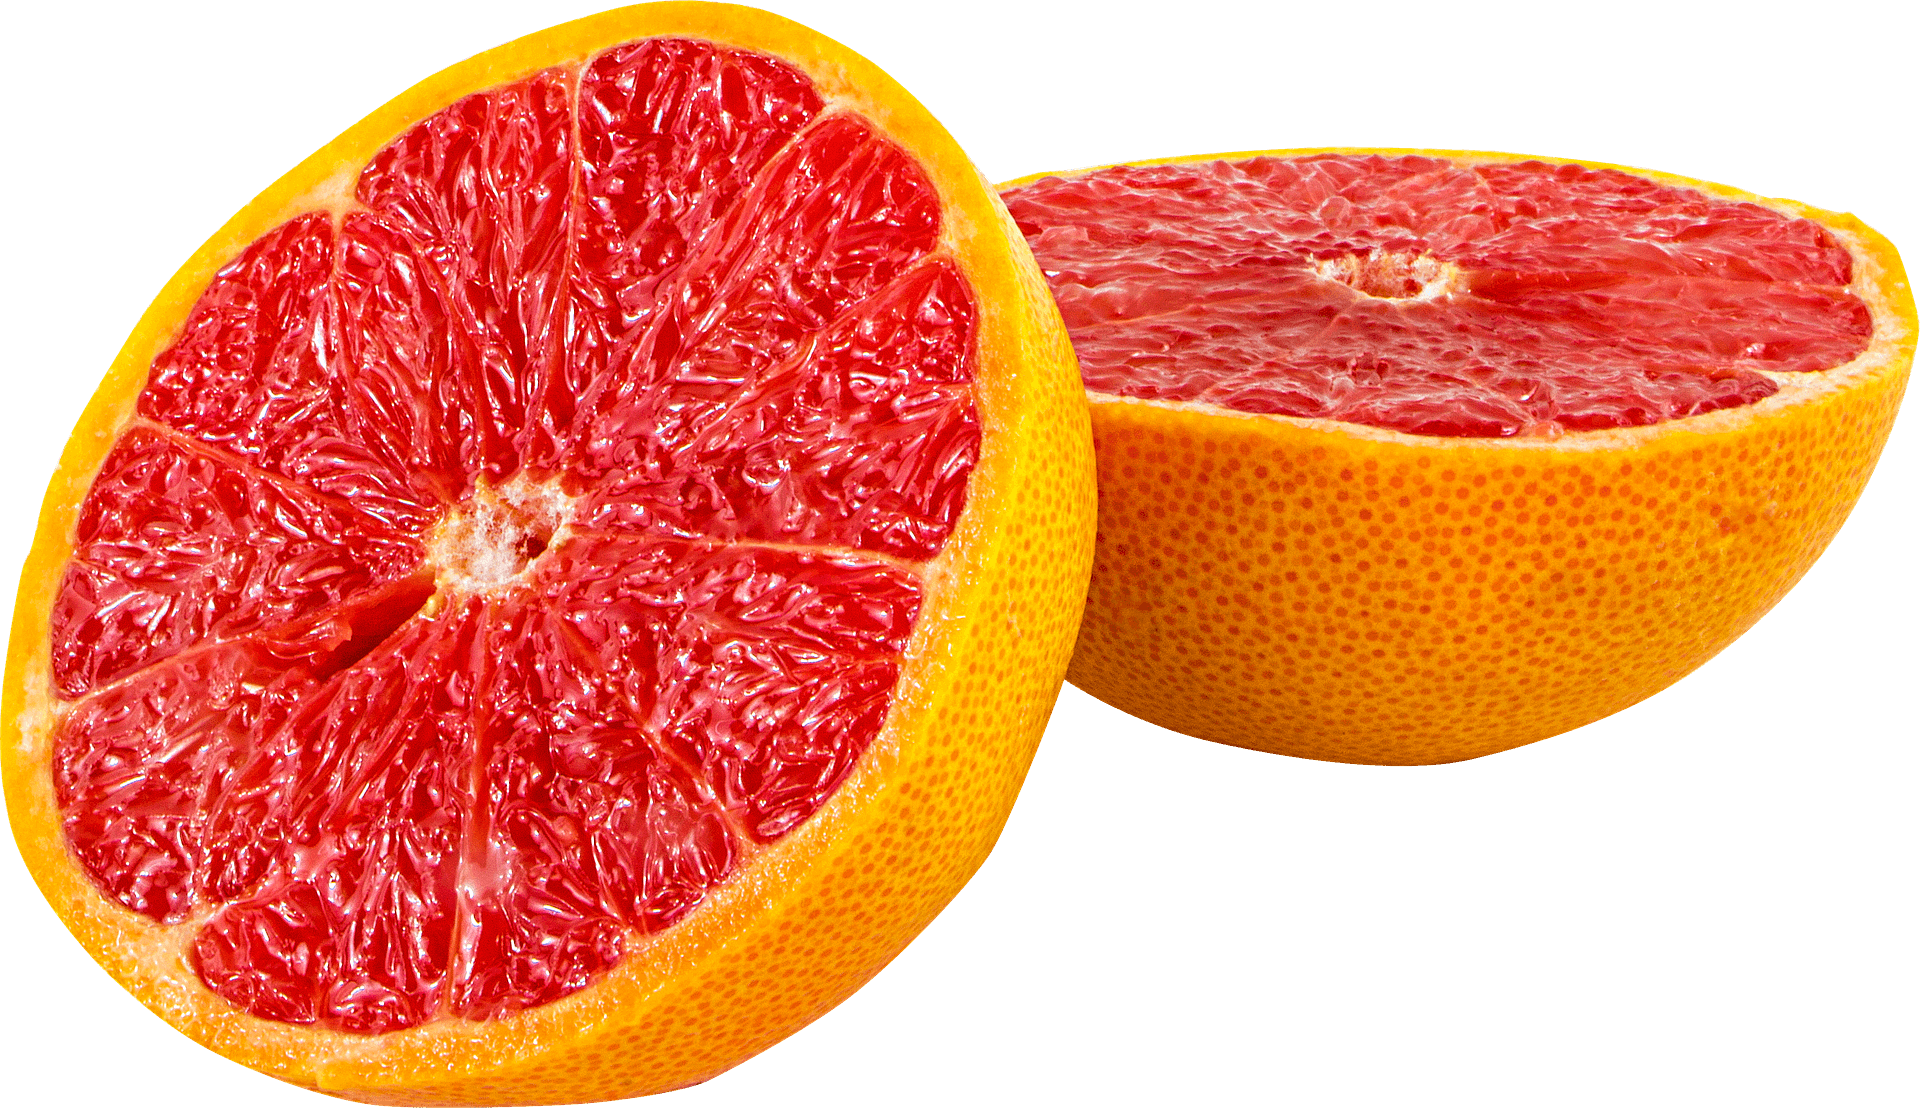 fruit-1220367_1920 (1)